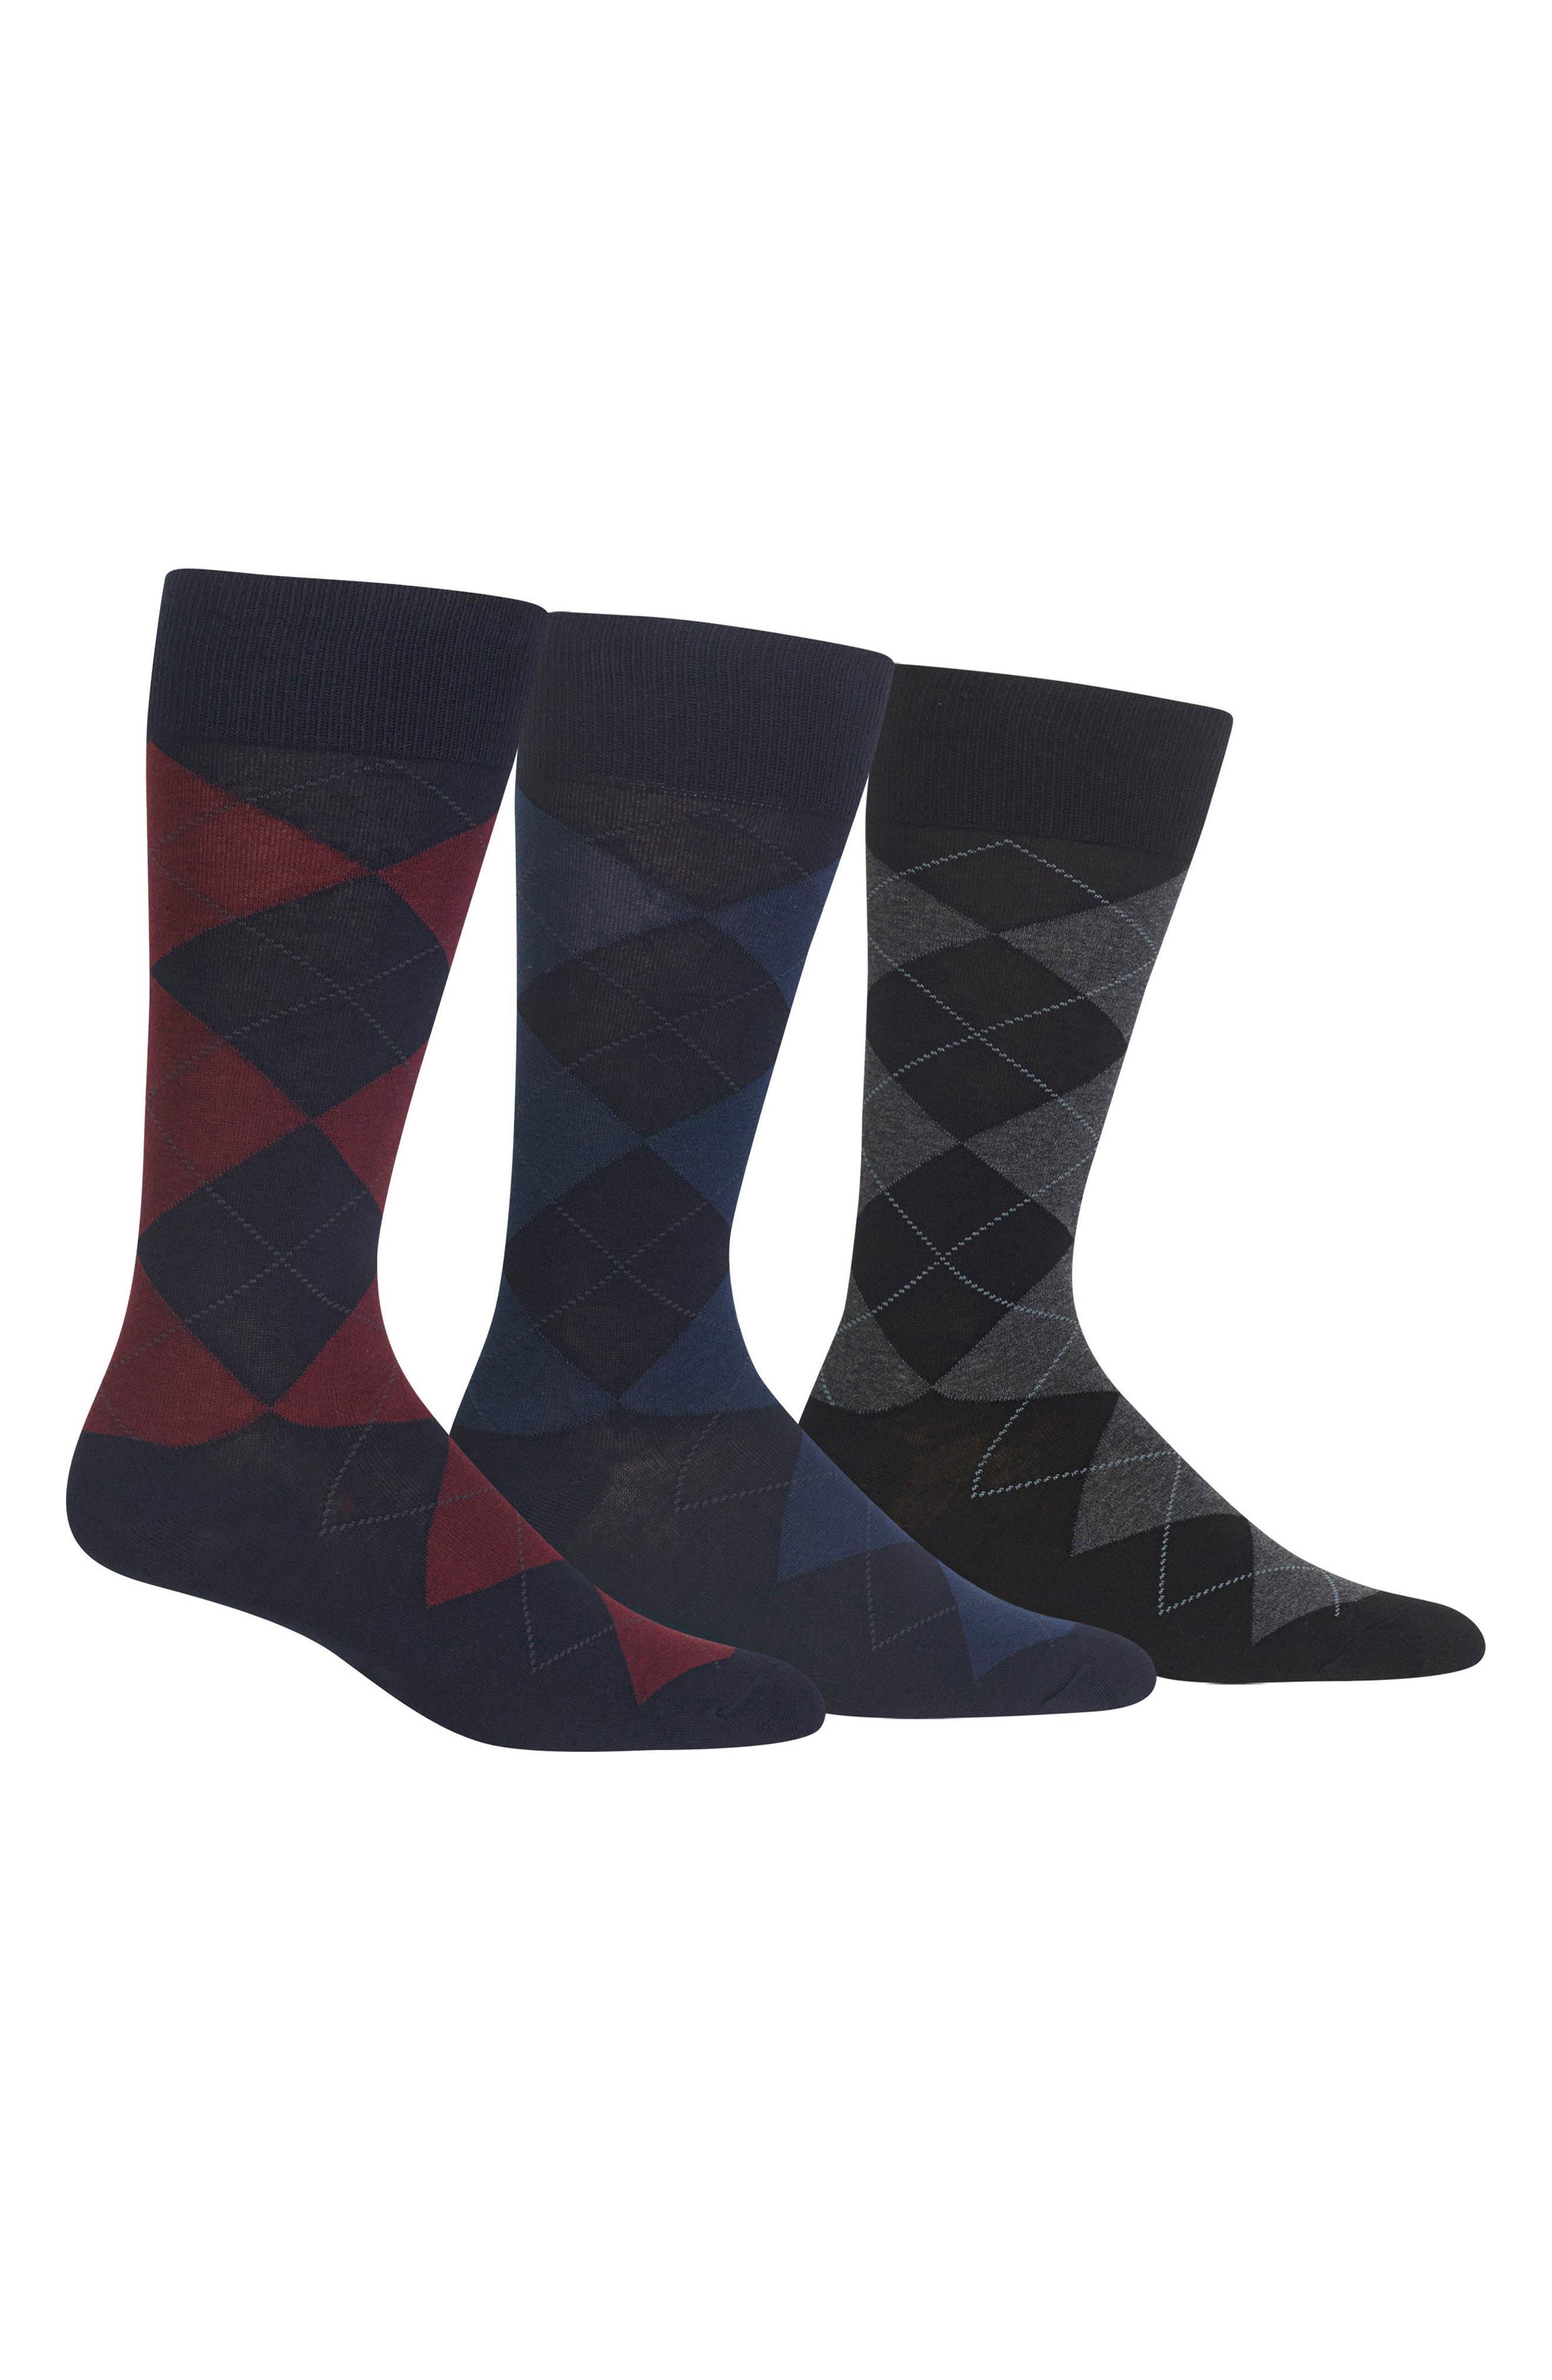 3-Pack Argyle Socks,                             Alternate thumbnail 2, color,                             NVY BURG/ NVY BLU/ BLK CHR